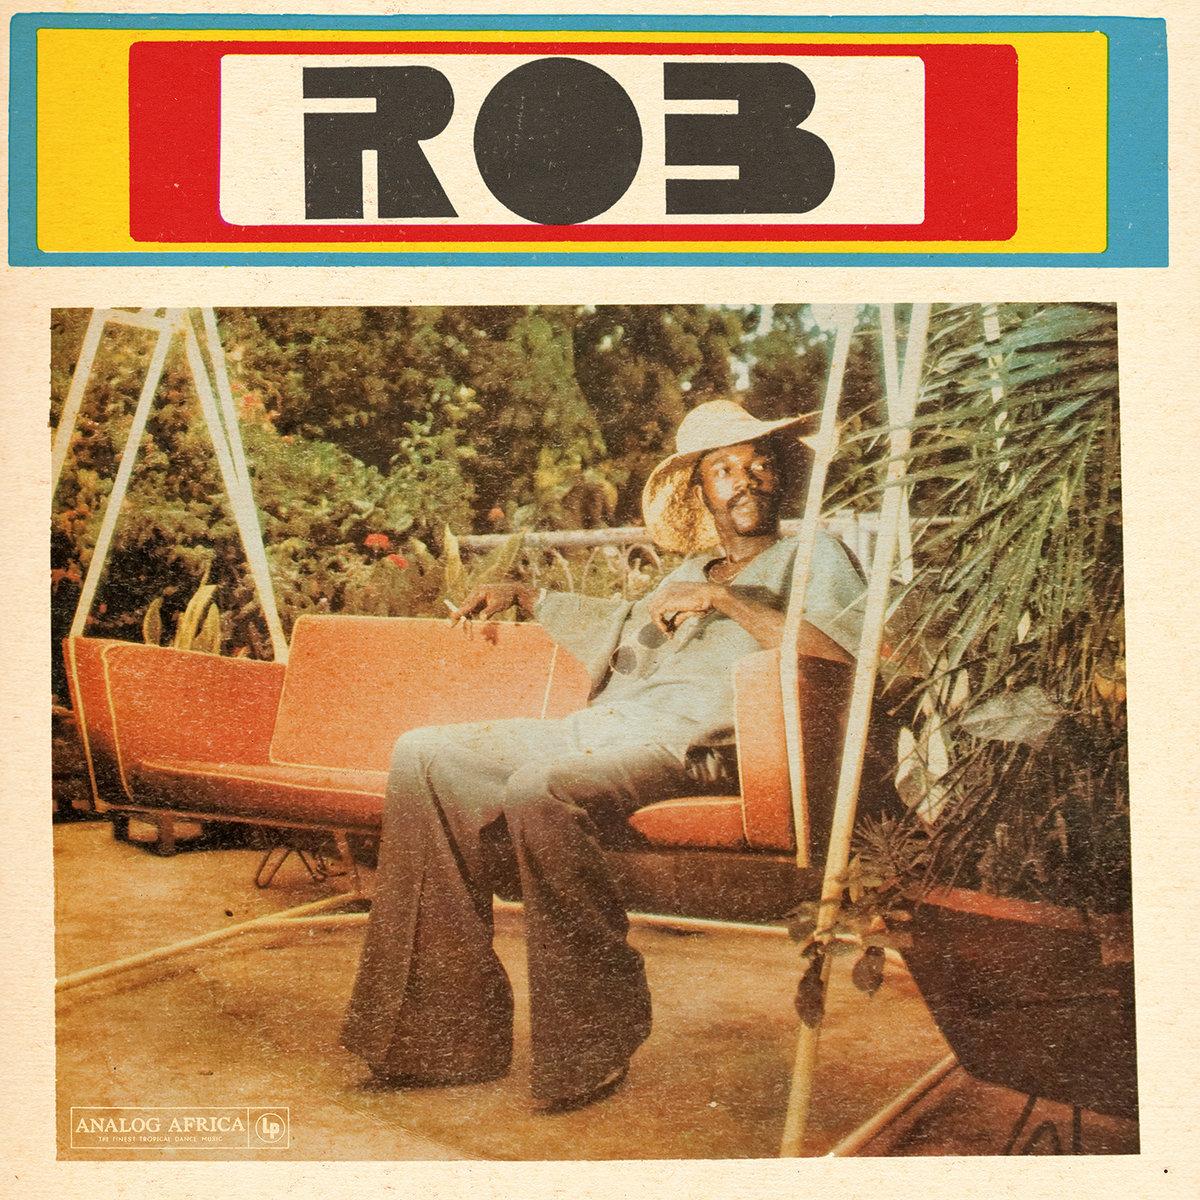 5. Rob - Funky Rob Way